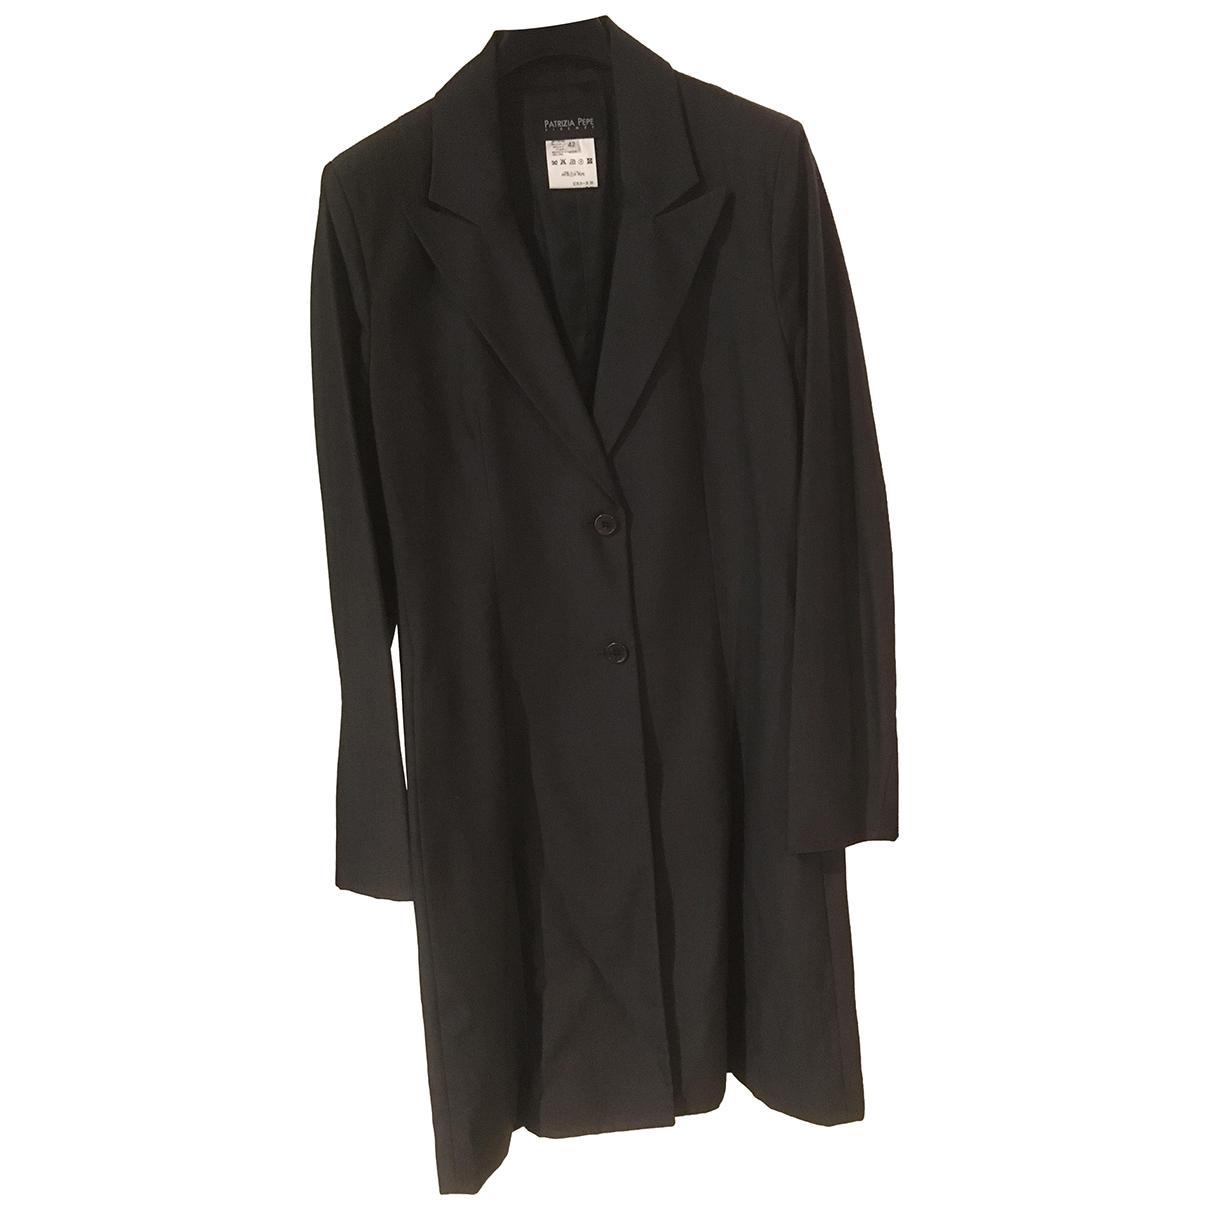 Patrizia Pepe - Robe   pour femme en laine - anthracite